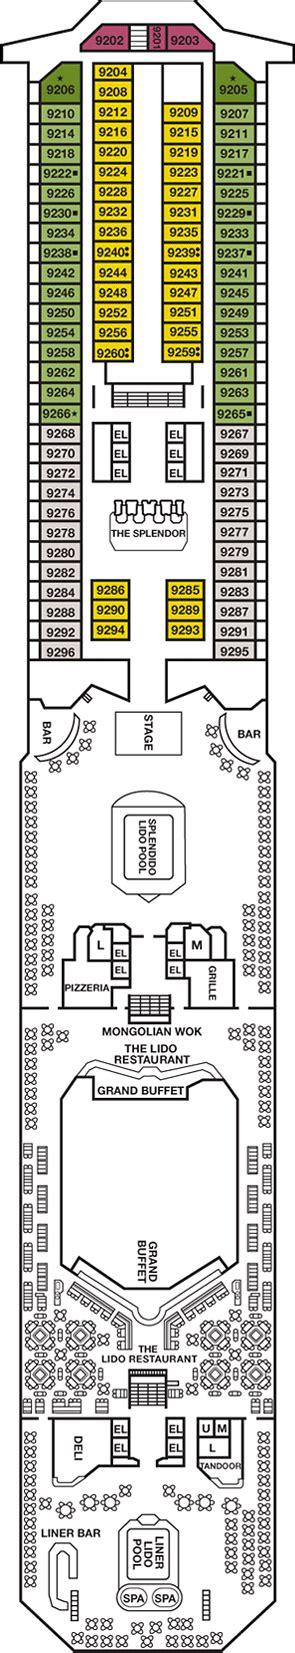 Carnival Splendor Lido Deck Plan by Carnival Splendor Lido Deck Deck Plan Carnival Splendor